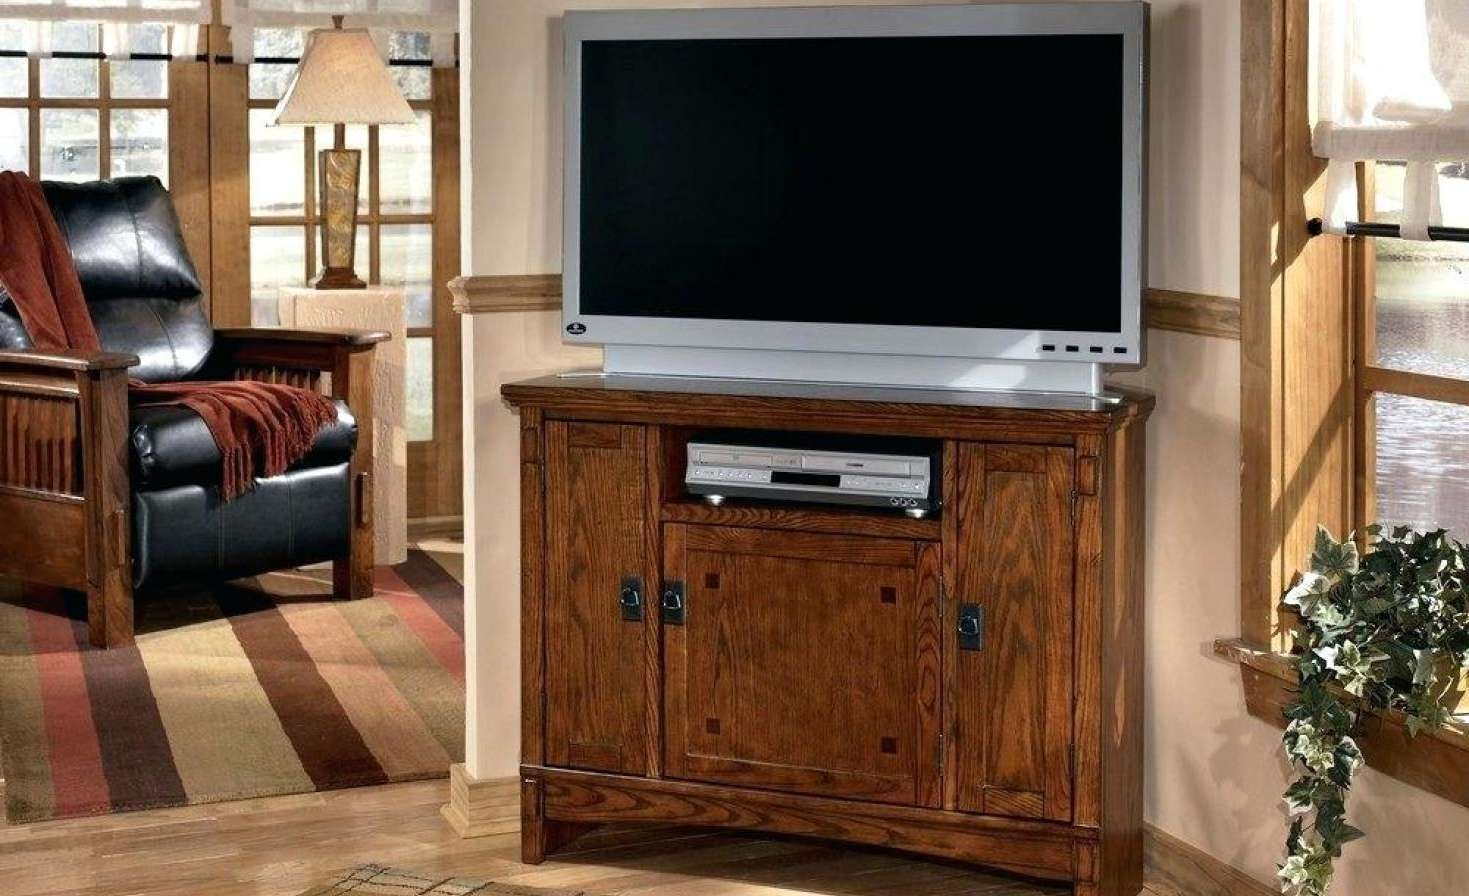 Tv : Inviting Off White Corner Tv Stands Elegant Off White Corner In Off White Corner Tv Stands (View 10 of 15)